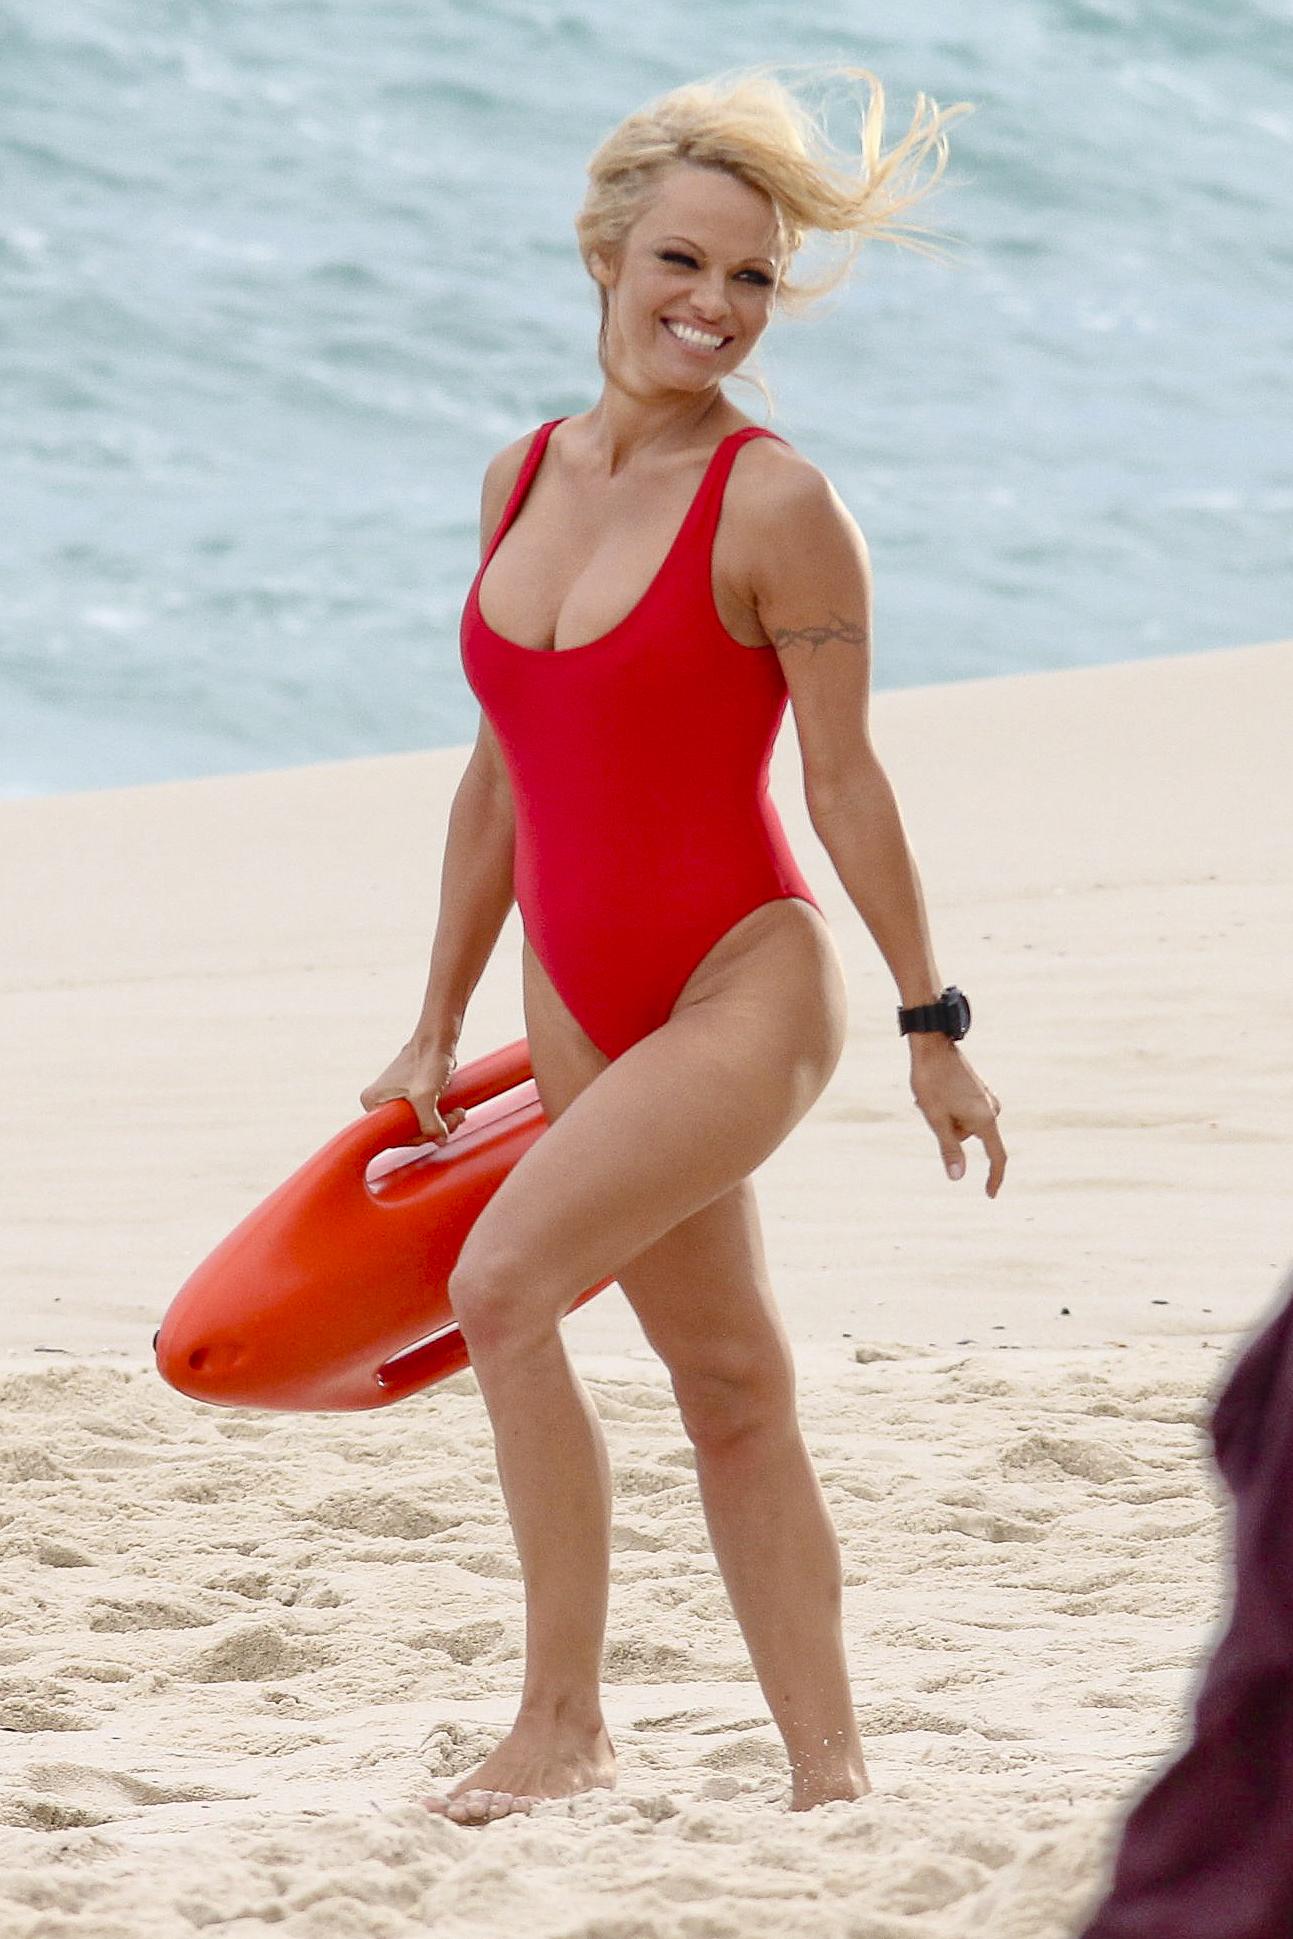 pam anderson pamela baywatch red suit beach lifeguard